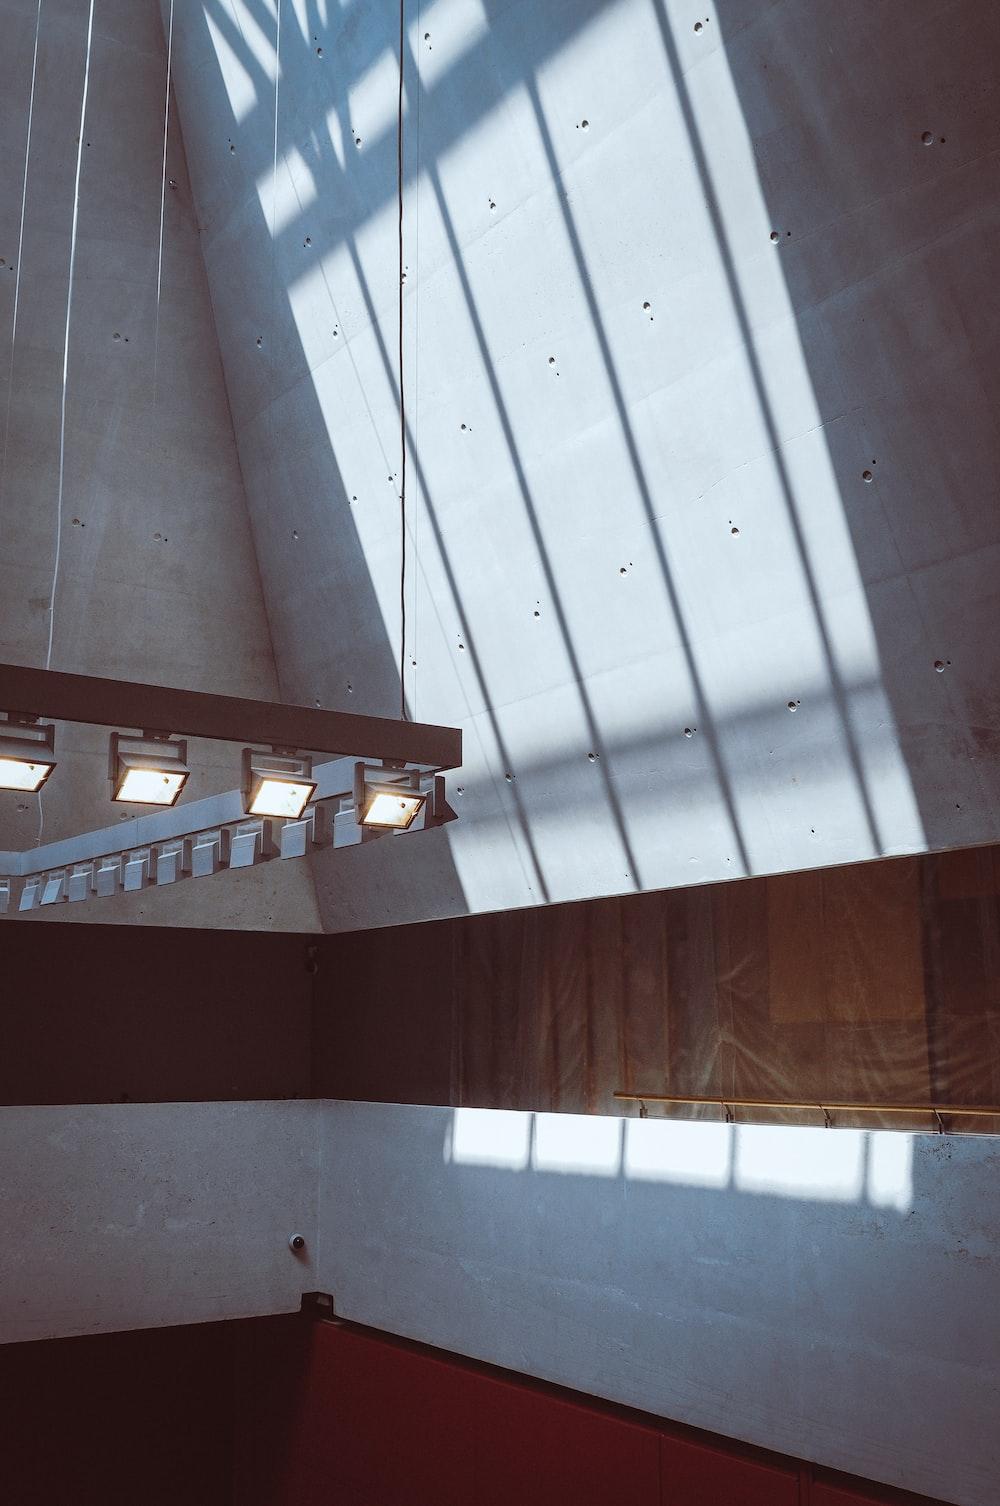 empty corner under lighted ceiling lamp